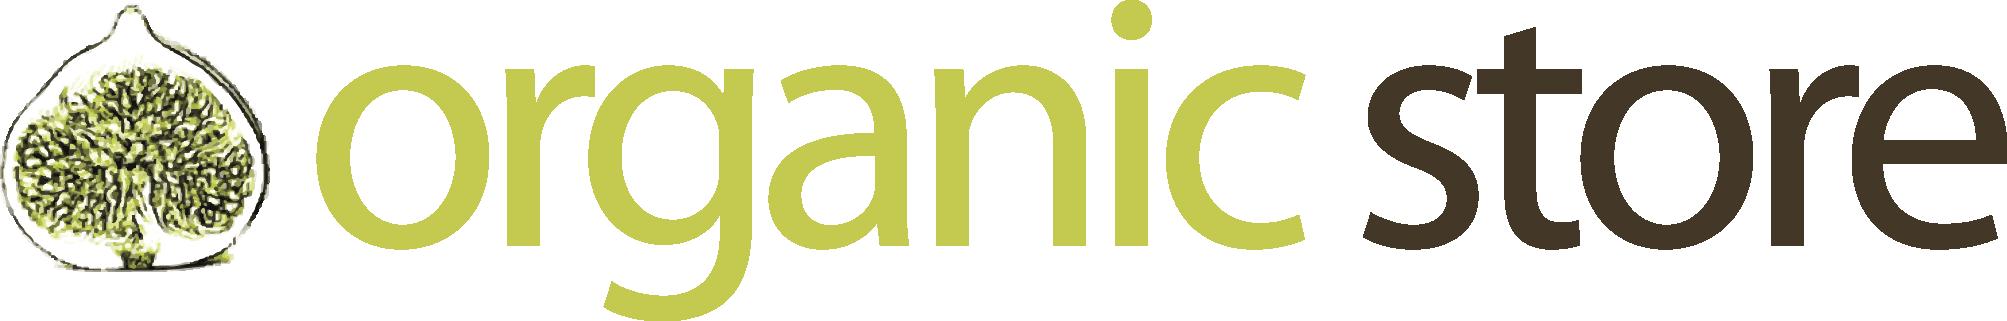 organicstore_logo